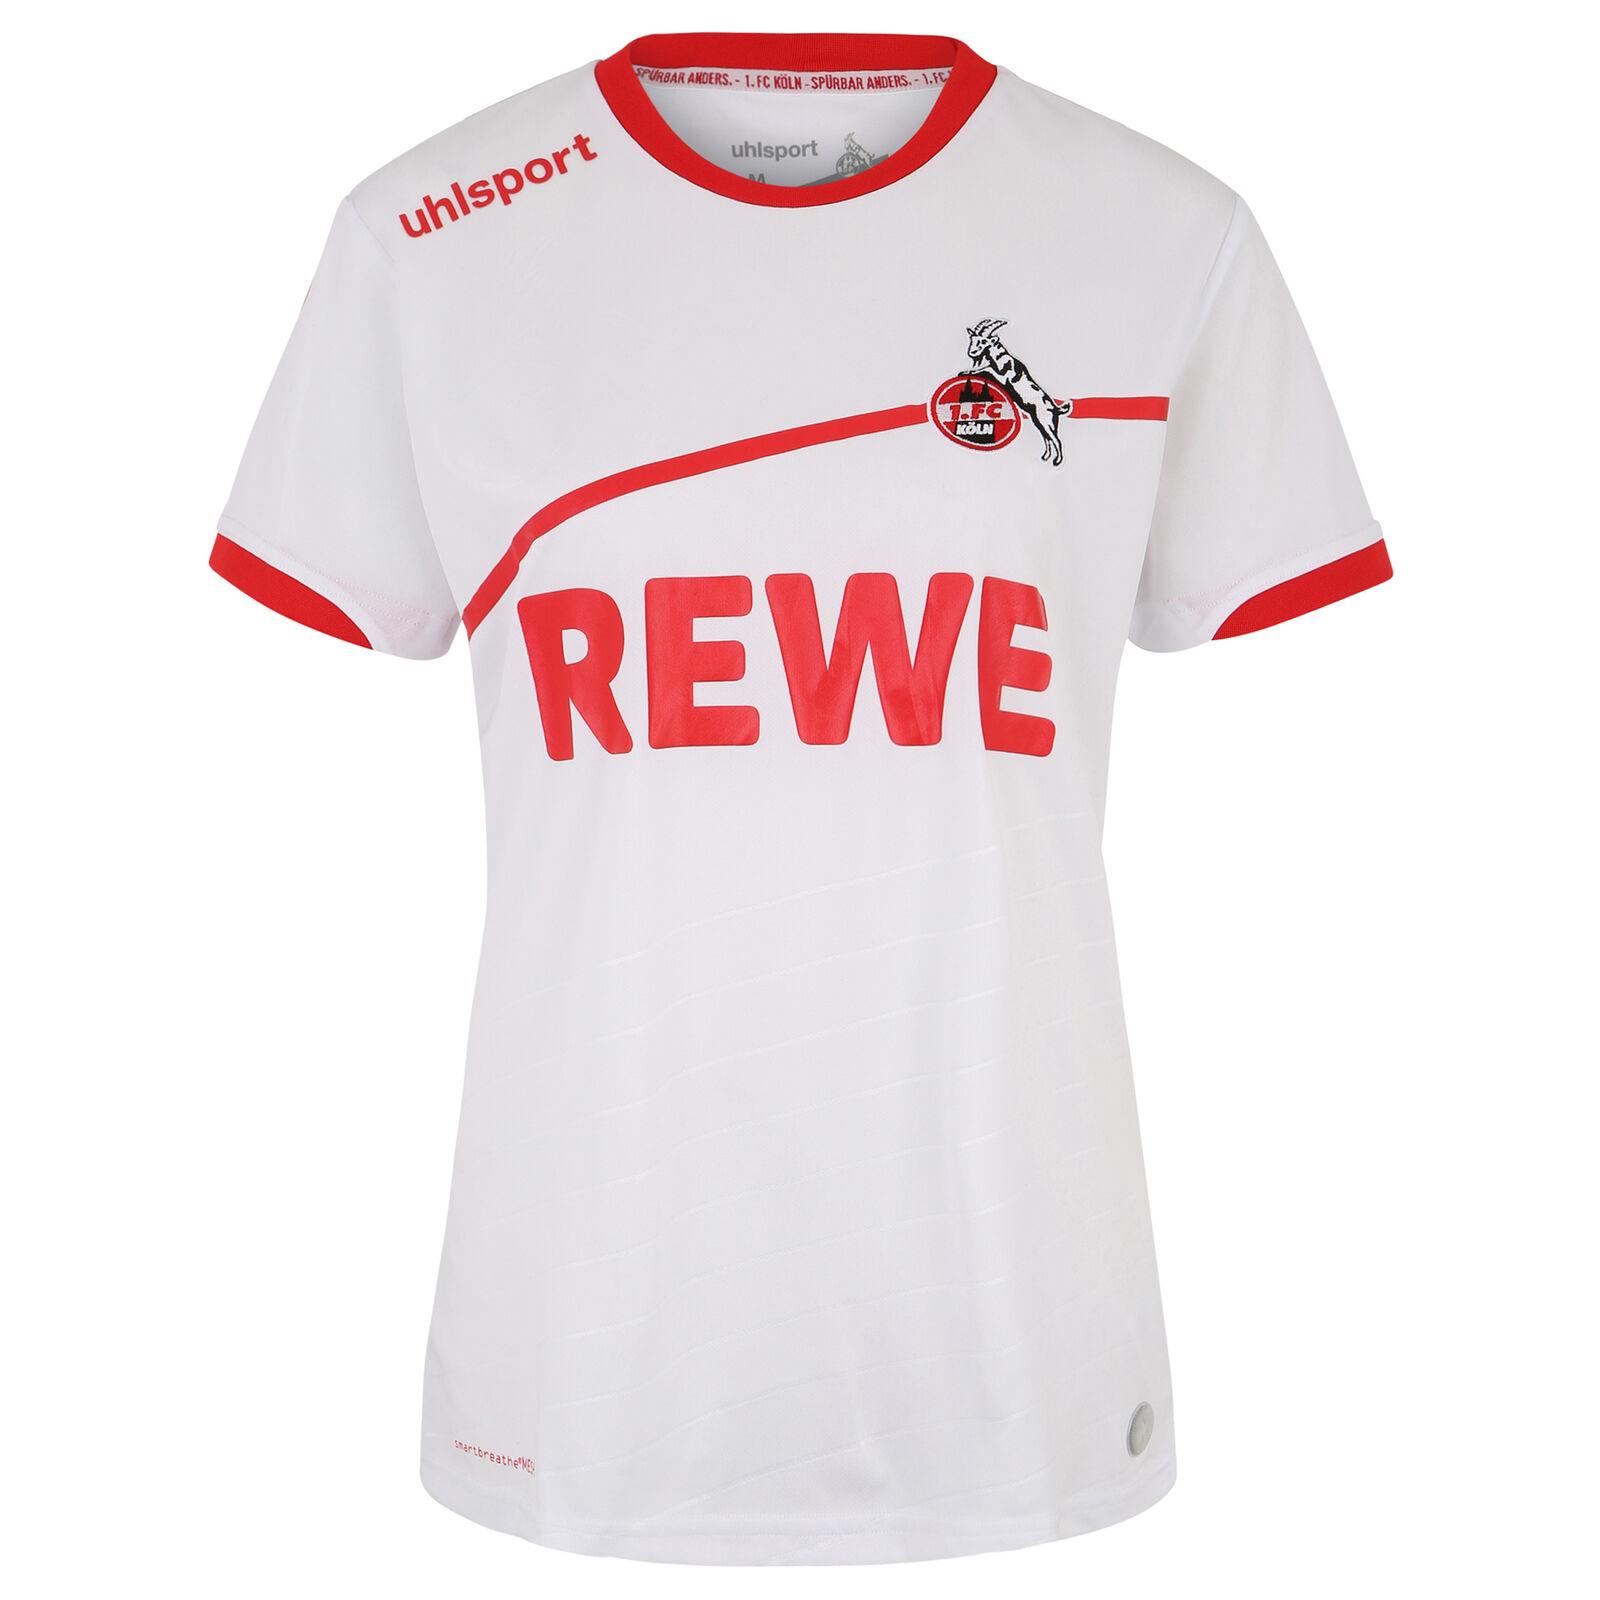 Uhlsport 1. FC Köln Trikot Home 2018/2019 Damen Weiß NEU